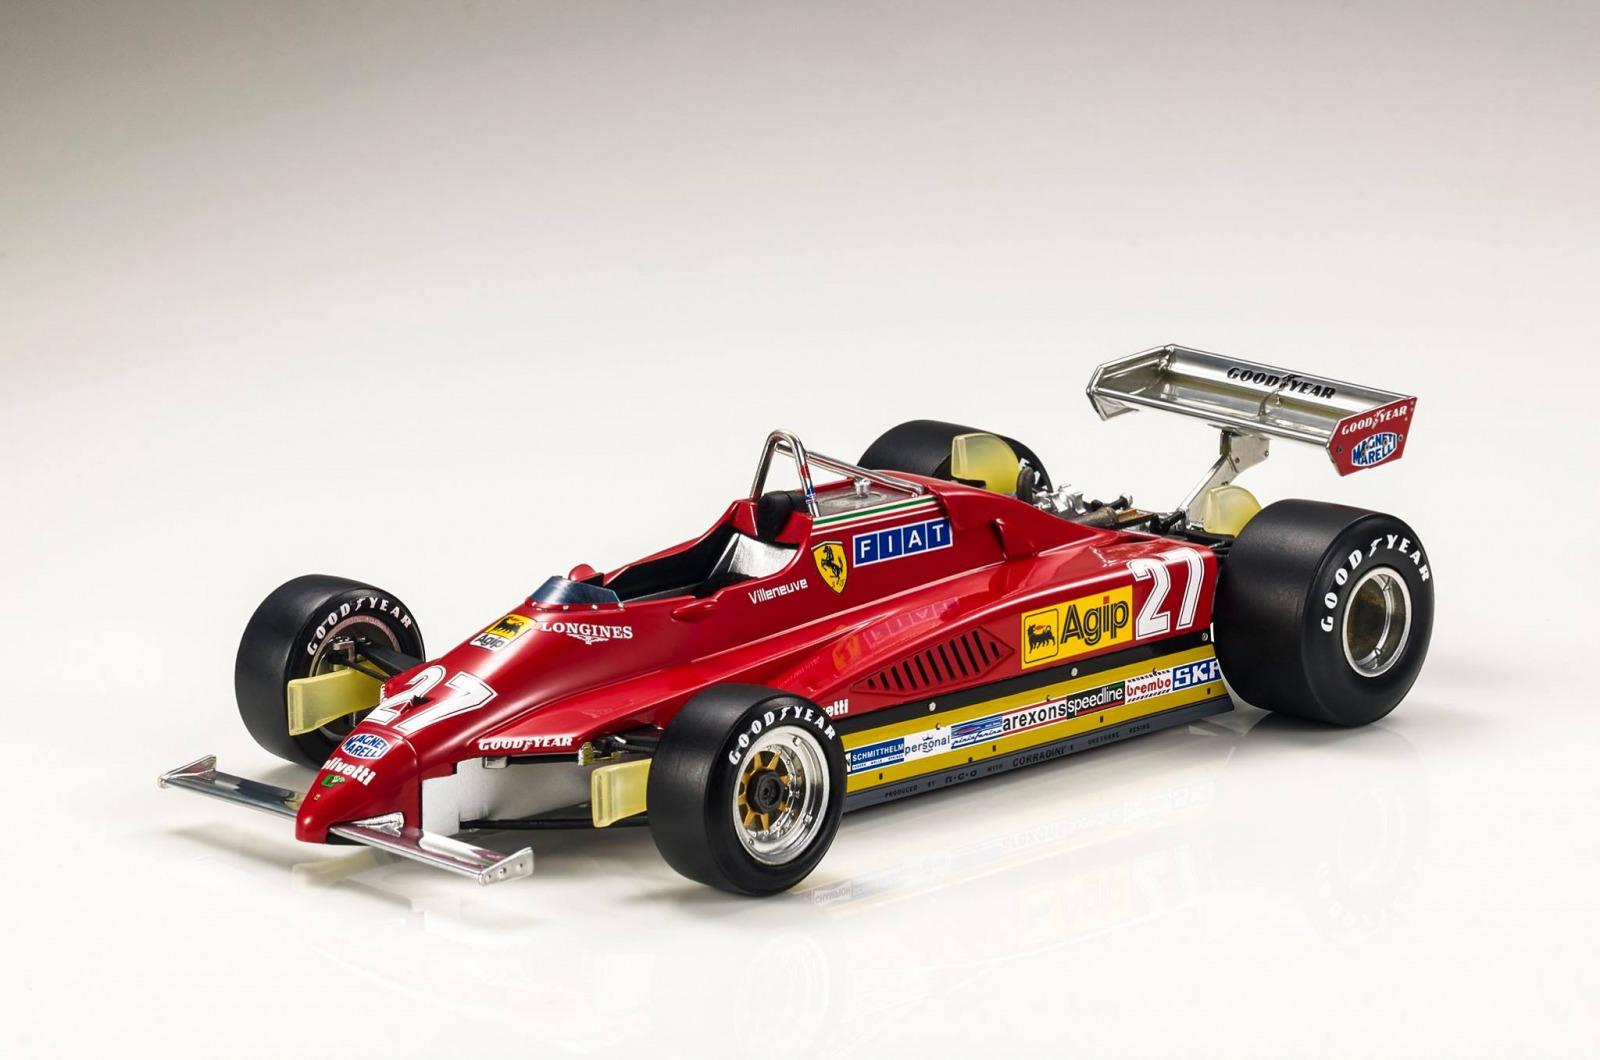 GP Replicas 1/18 ミニカー レジン・プロポーションモデル 1982年シーズン フェラーリ 126 C2Ferrari 126 C2 1982 1:18 GP Replicas